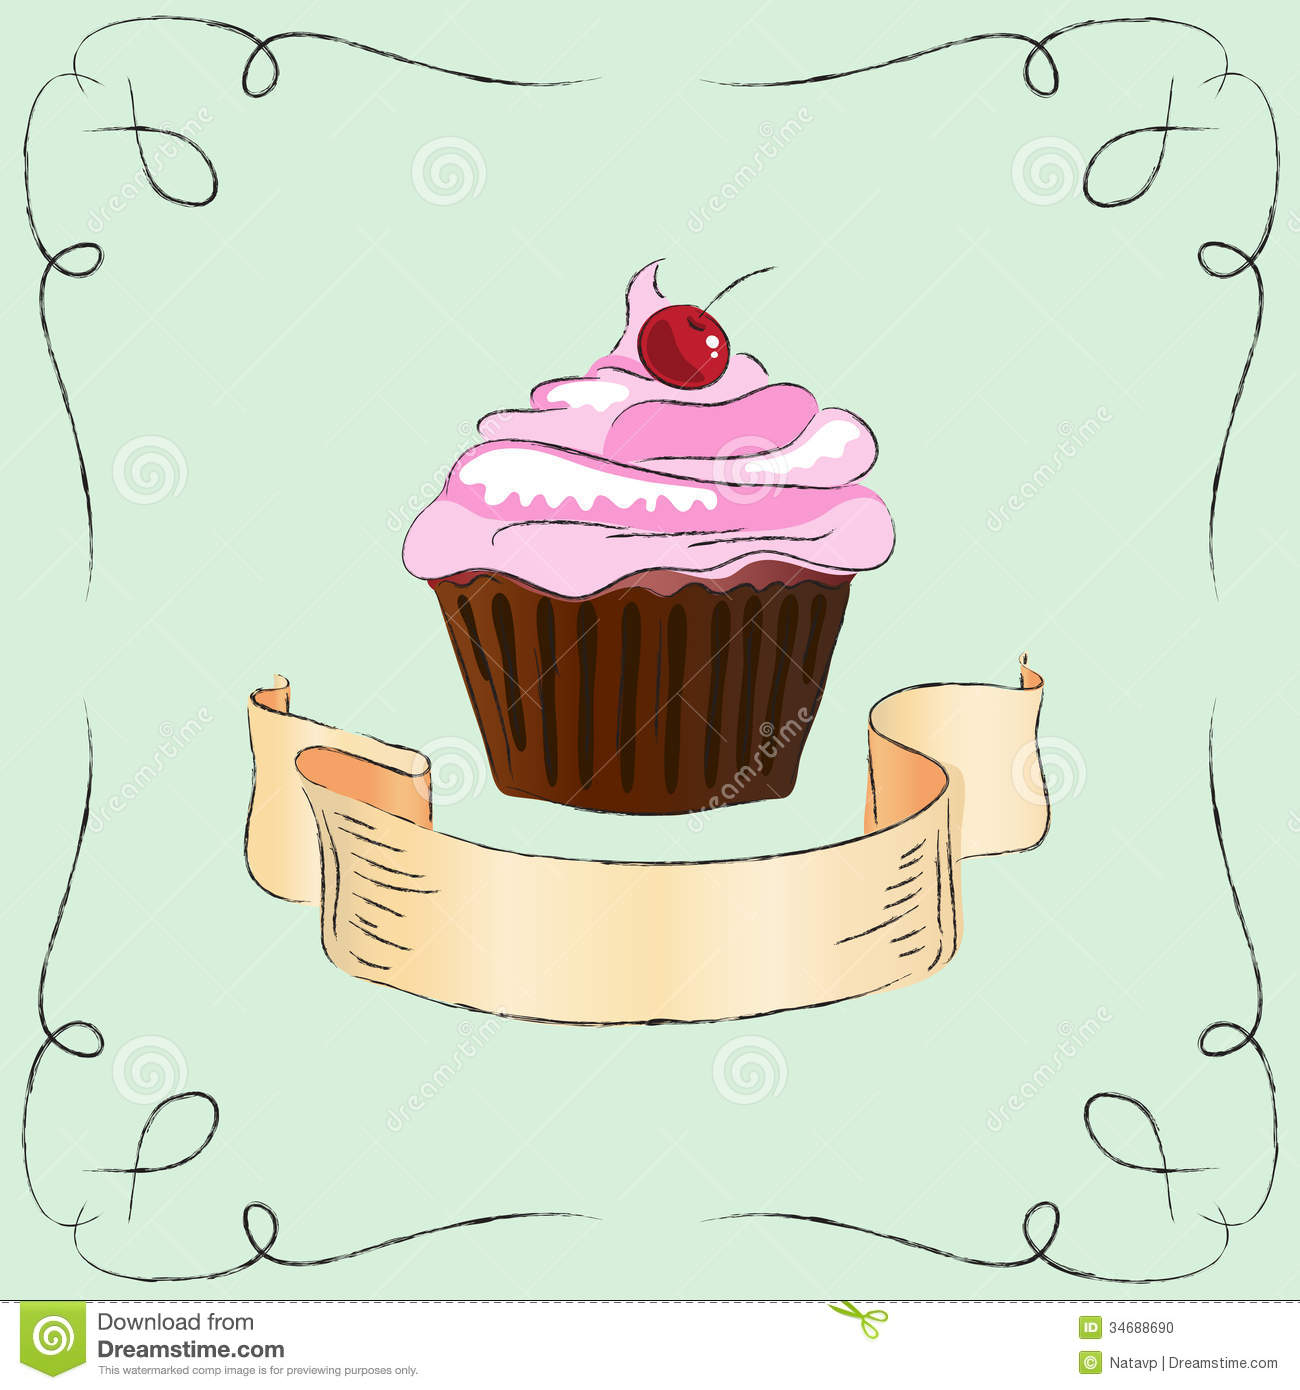 Vintage cake clipart clip art royalty free download Nice Vintage Cake Stock Photo - Image: 34688690 clip art royalty free download